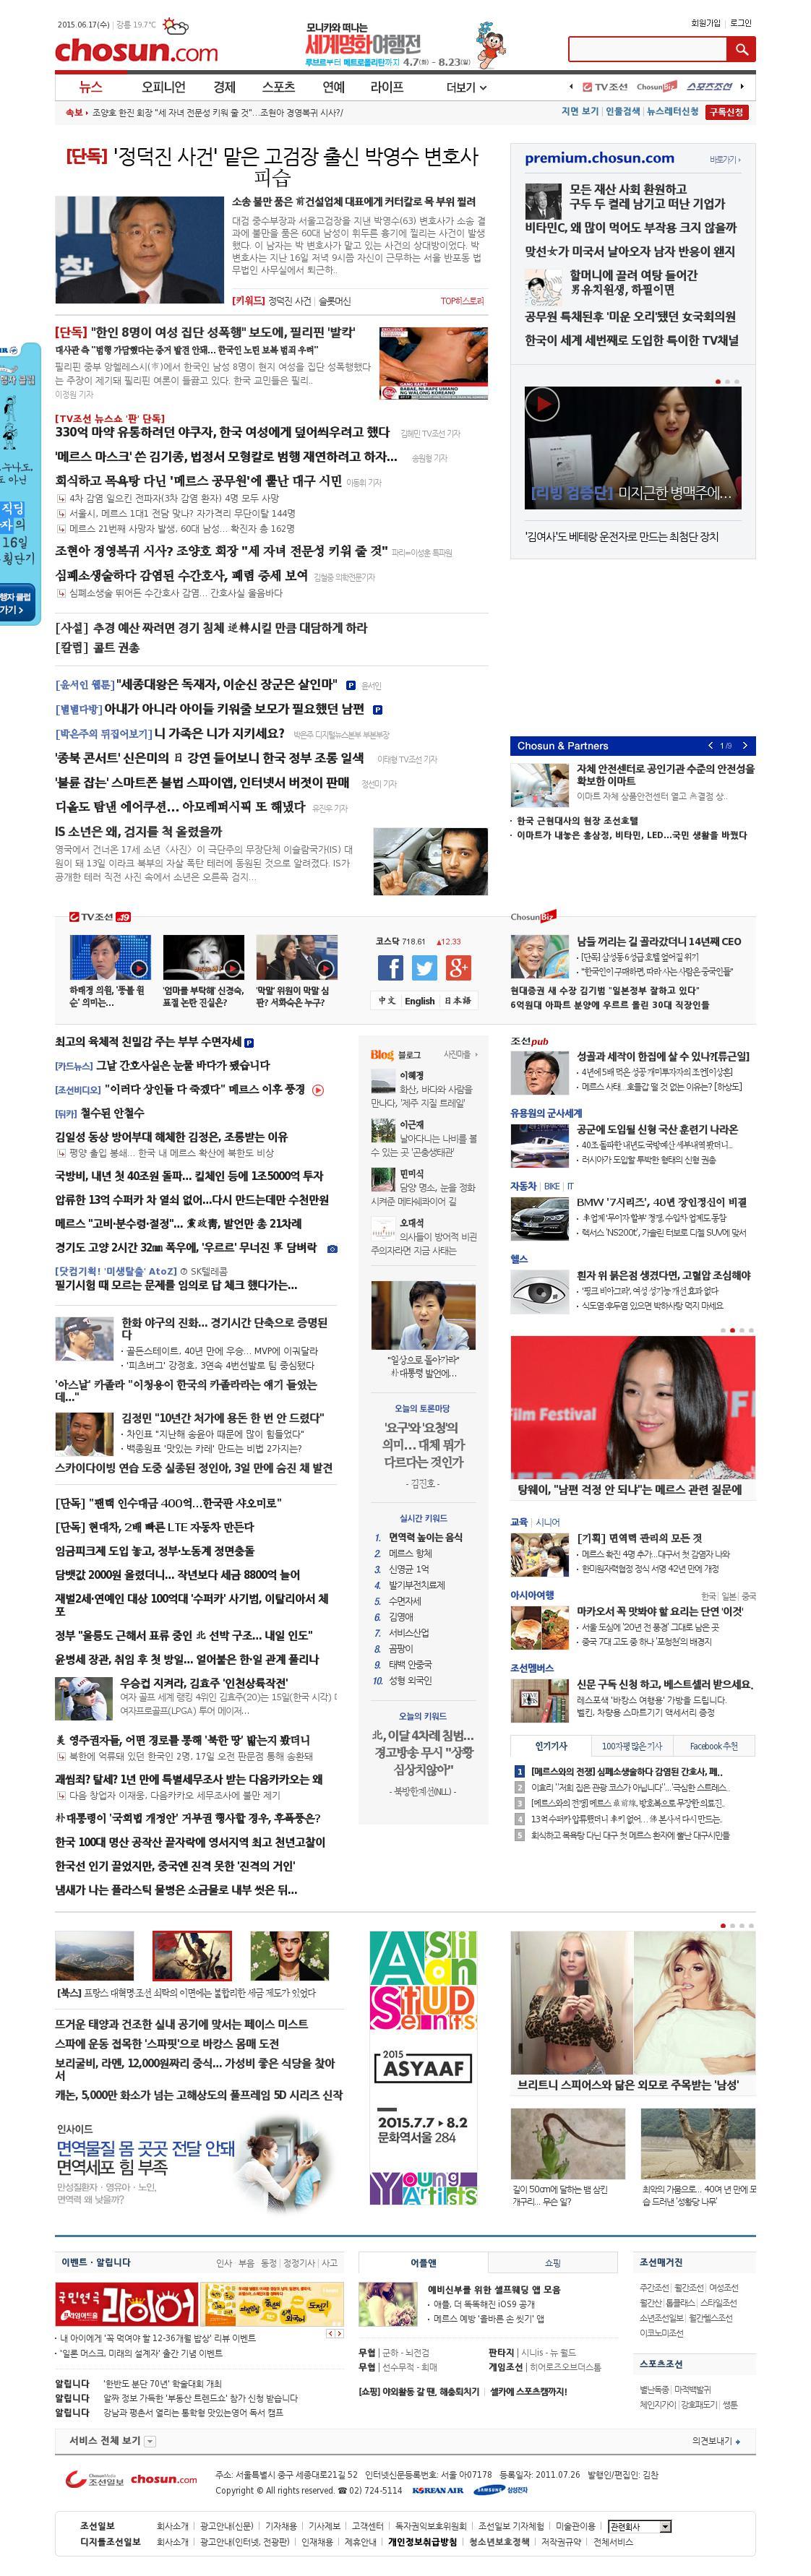 chosun.com at Wednesday June 17, 2015, 2:02 p.m. UTC